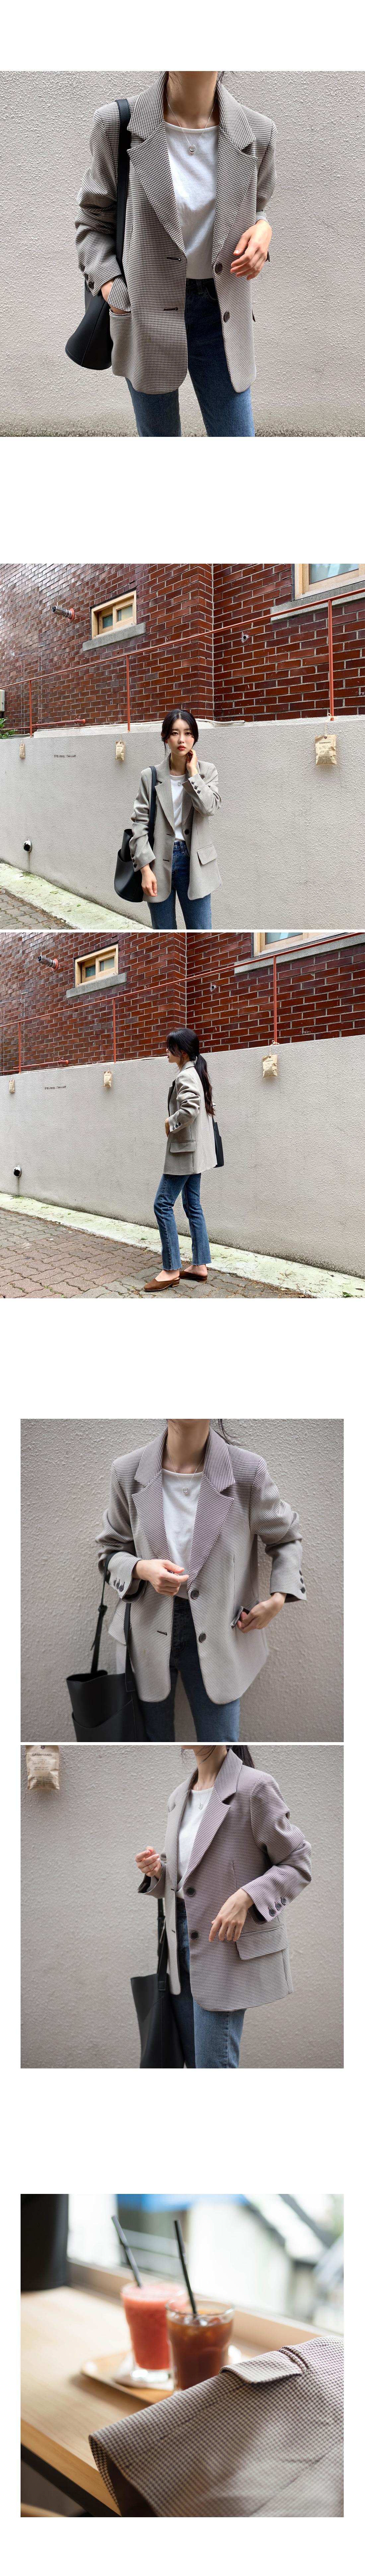 Hound Check Single Jacket